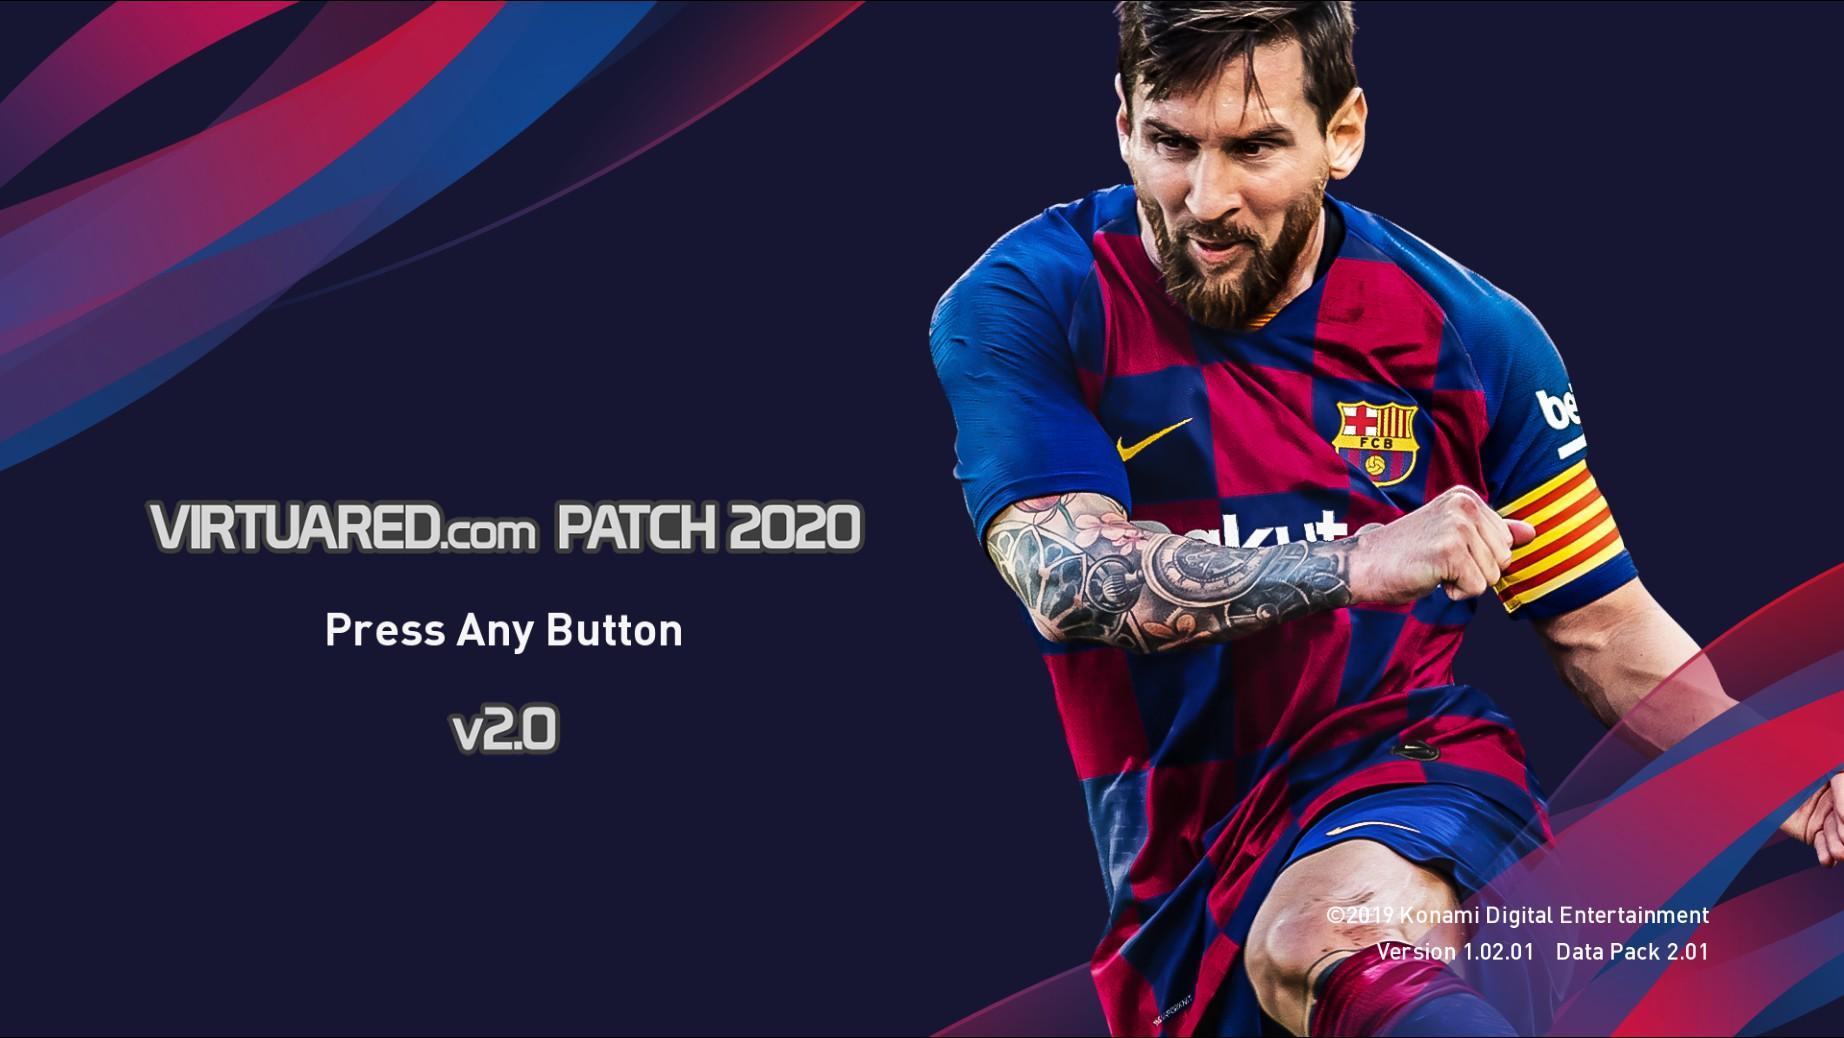 VirtuaRED.com Patch 2020 v2.0 ¡ya disponible!